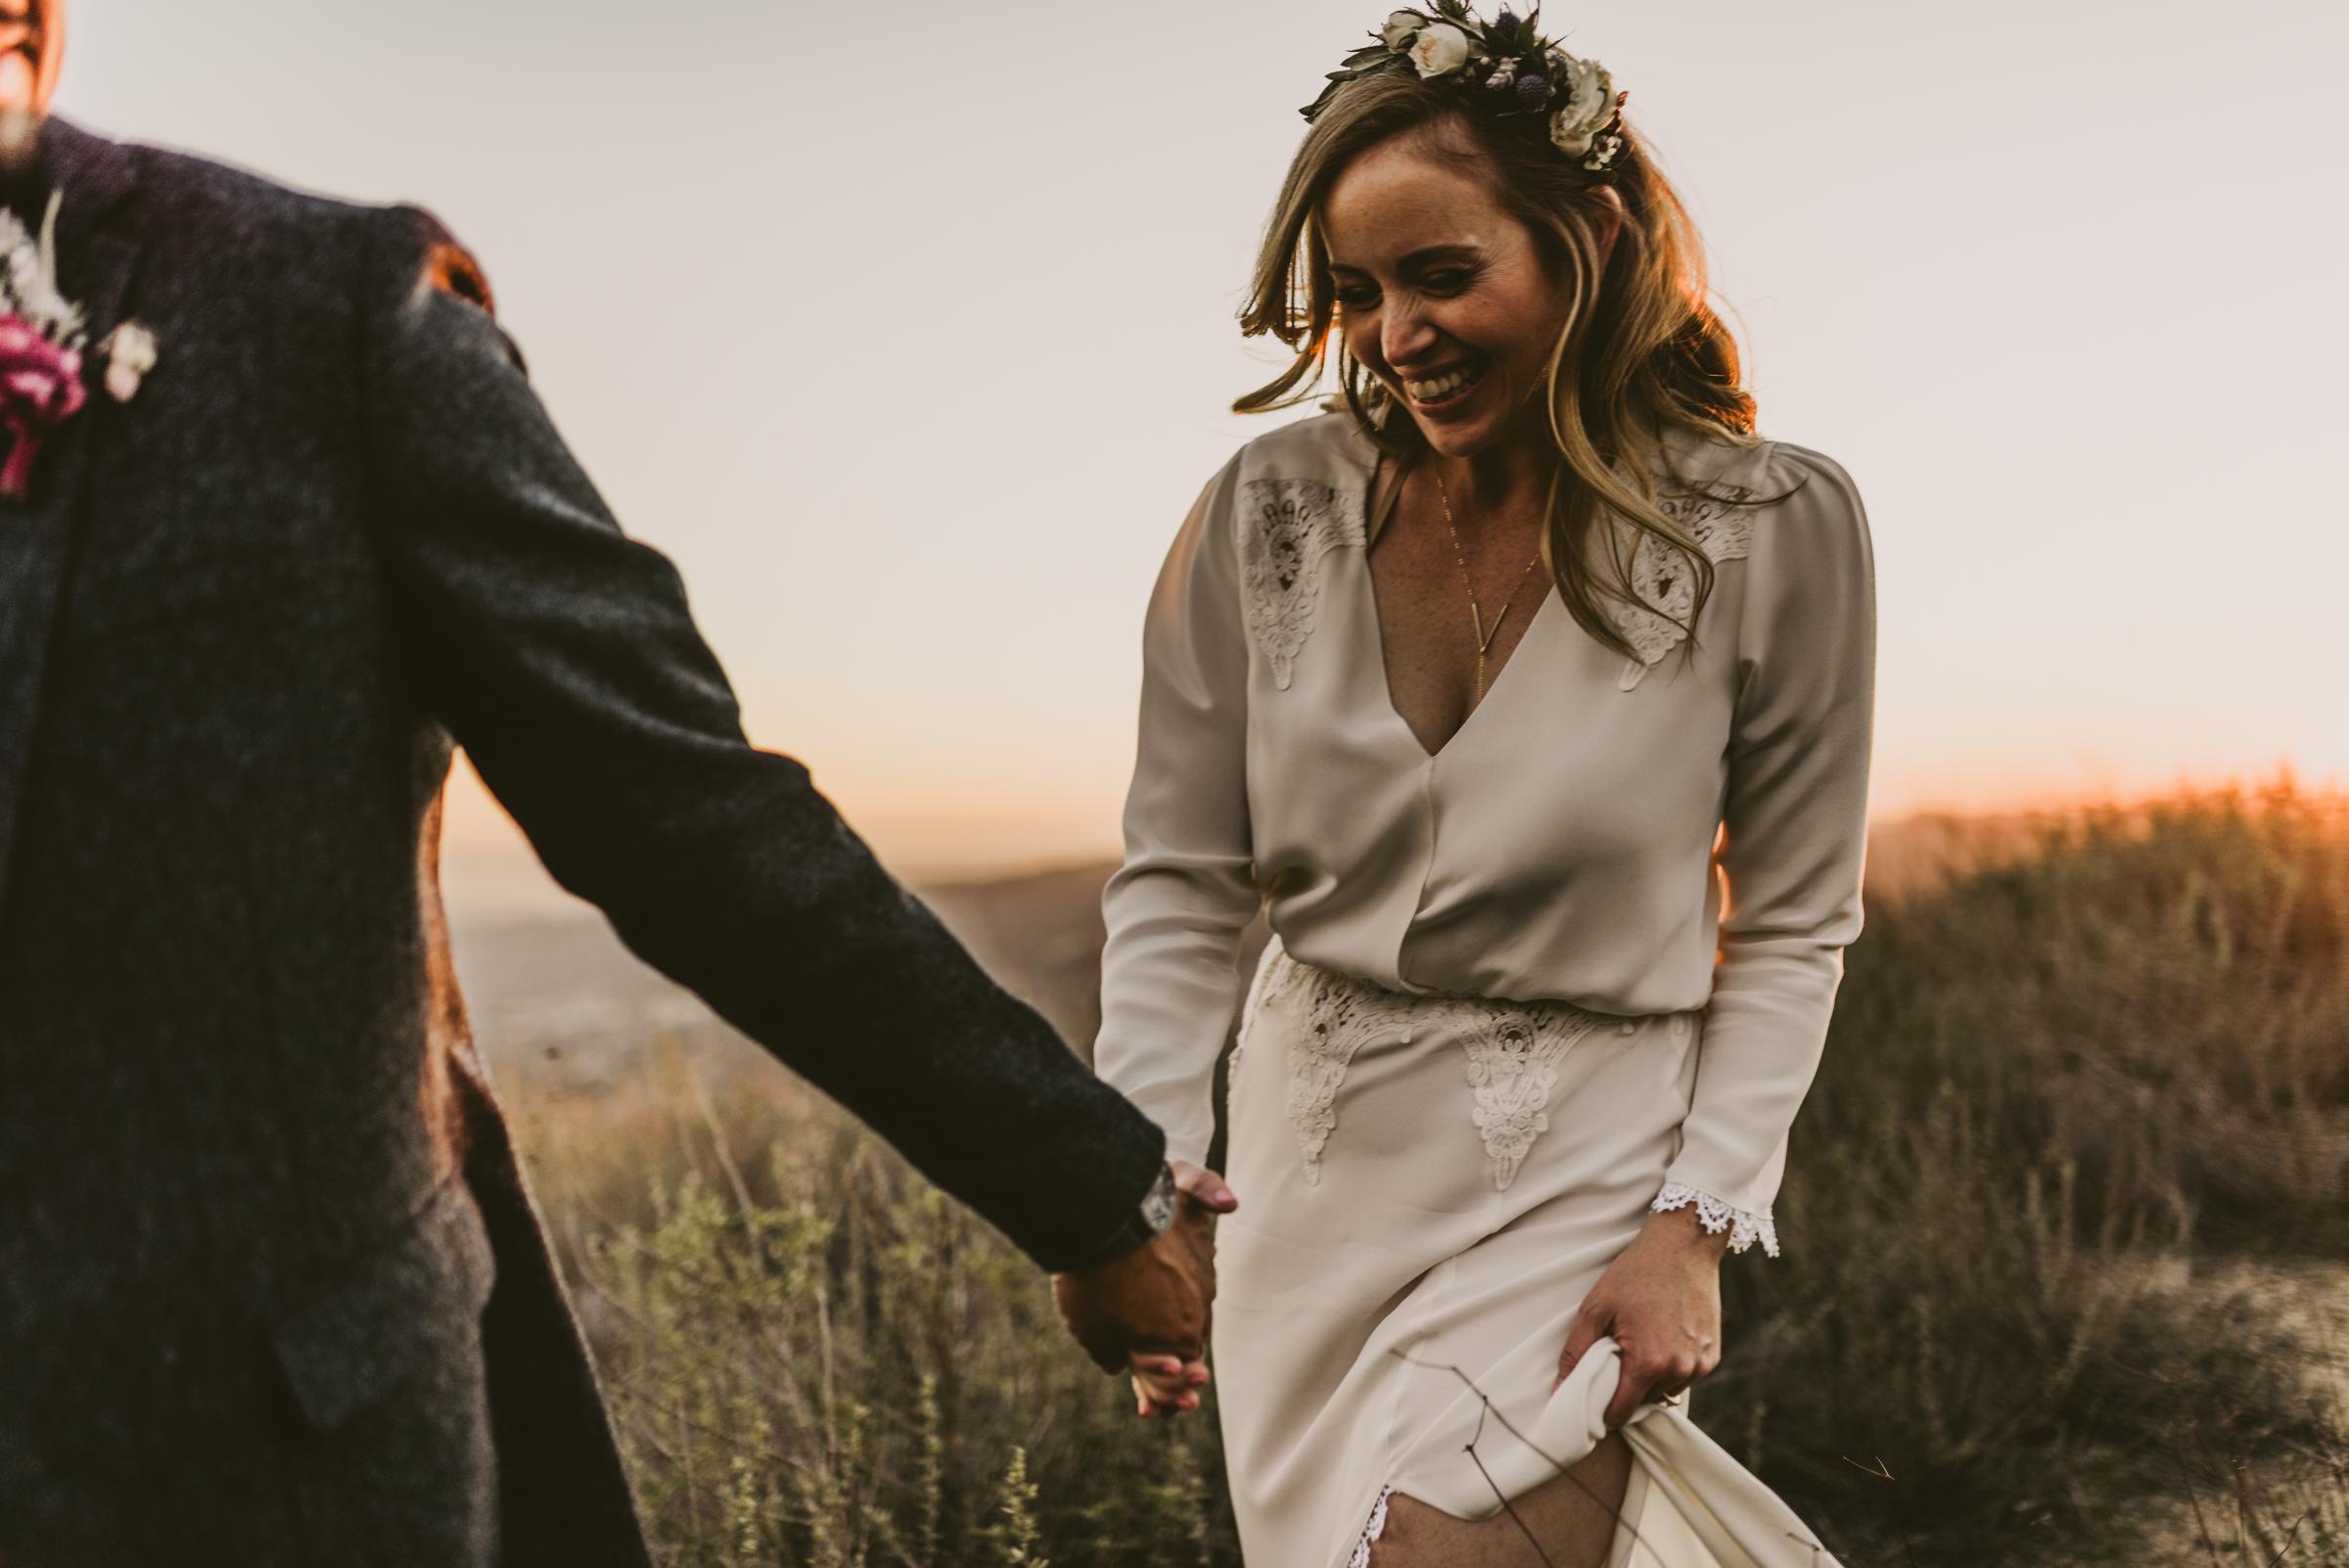 ©Isaiah + Taylor Photography - Intimate Elopement, Eaton Canyon, Los Angeles Wedding Photographer-108.jpg